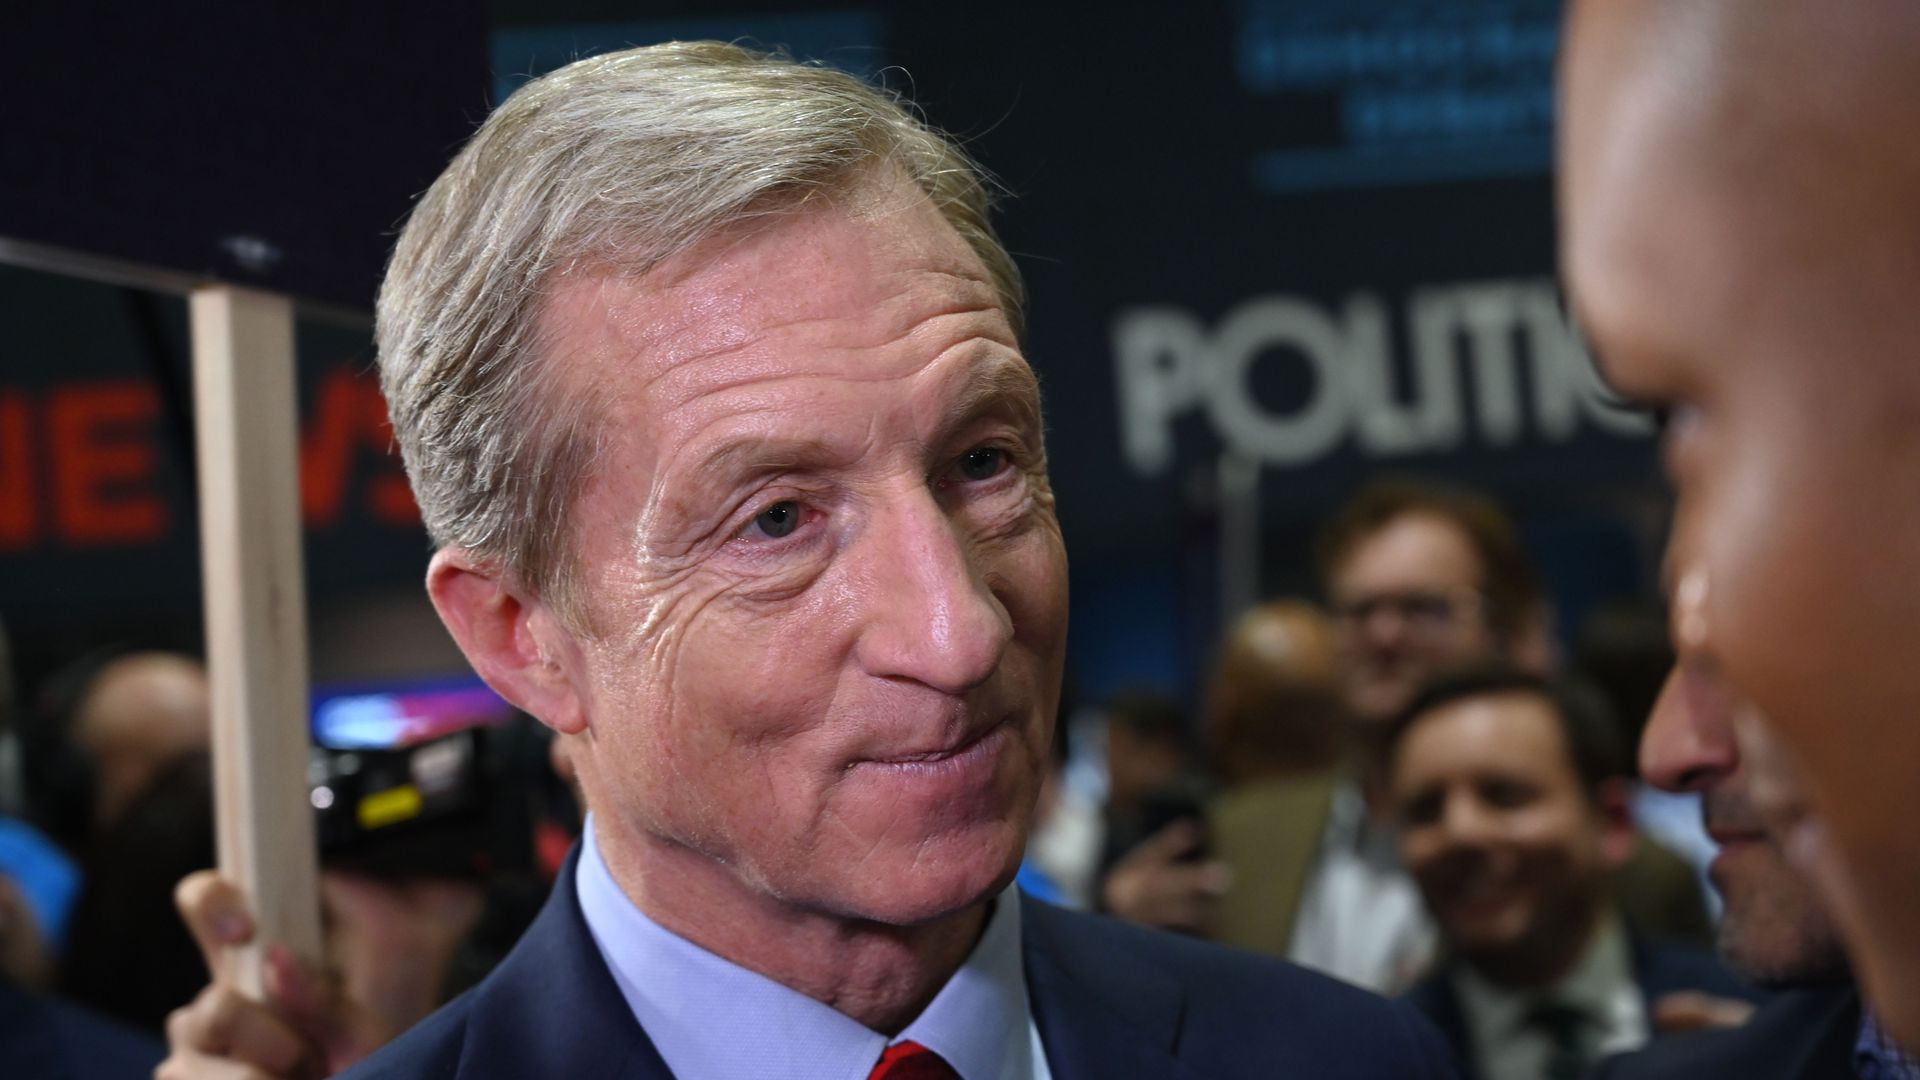 Tom Steyer speaks to reporters after a Democratic debate